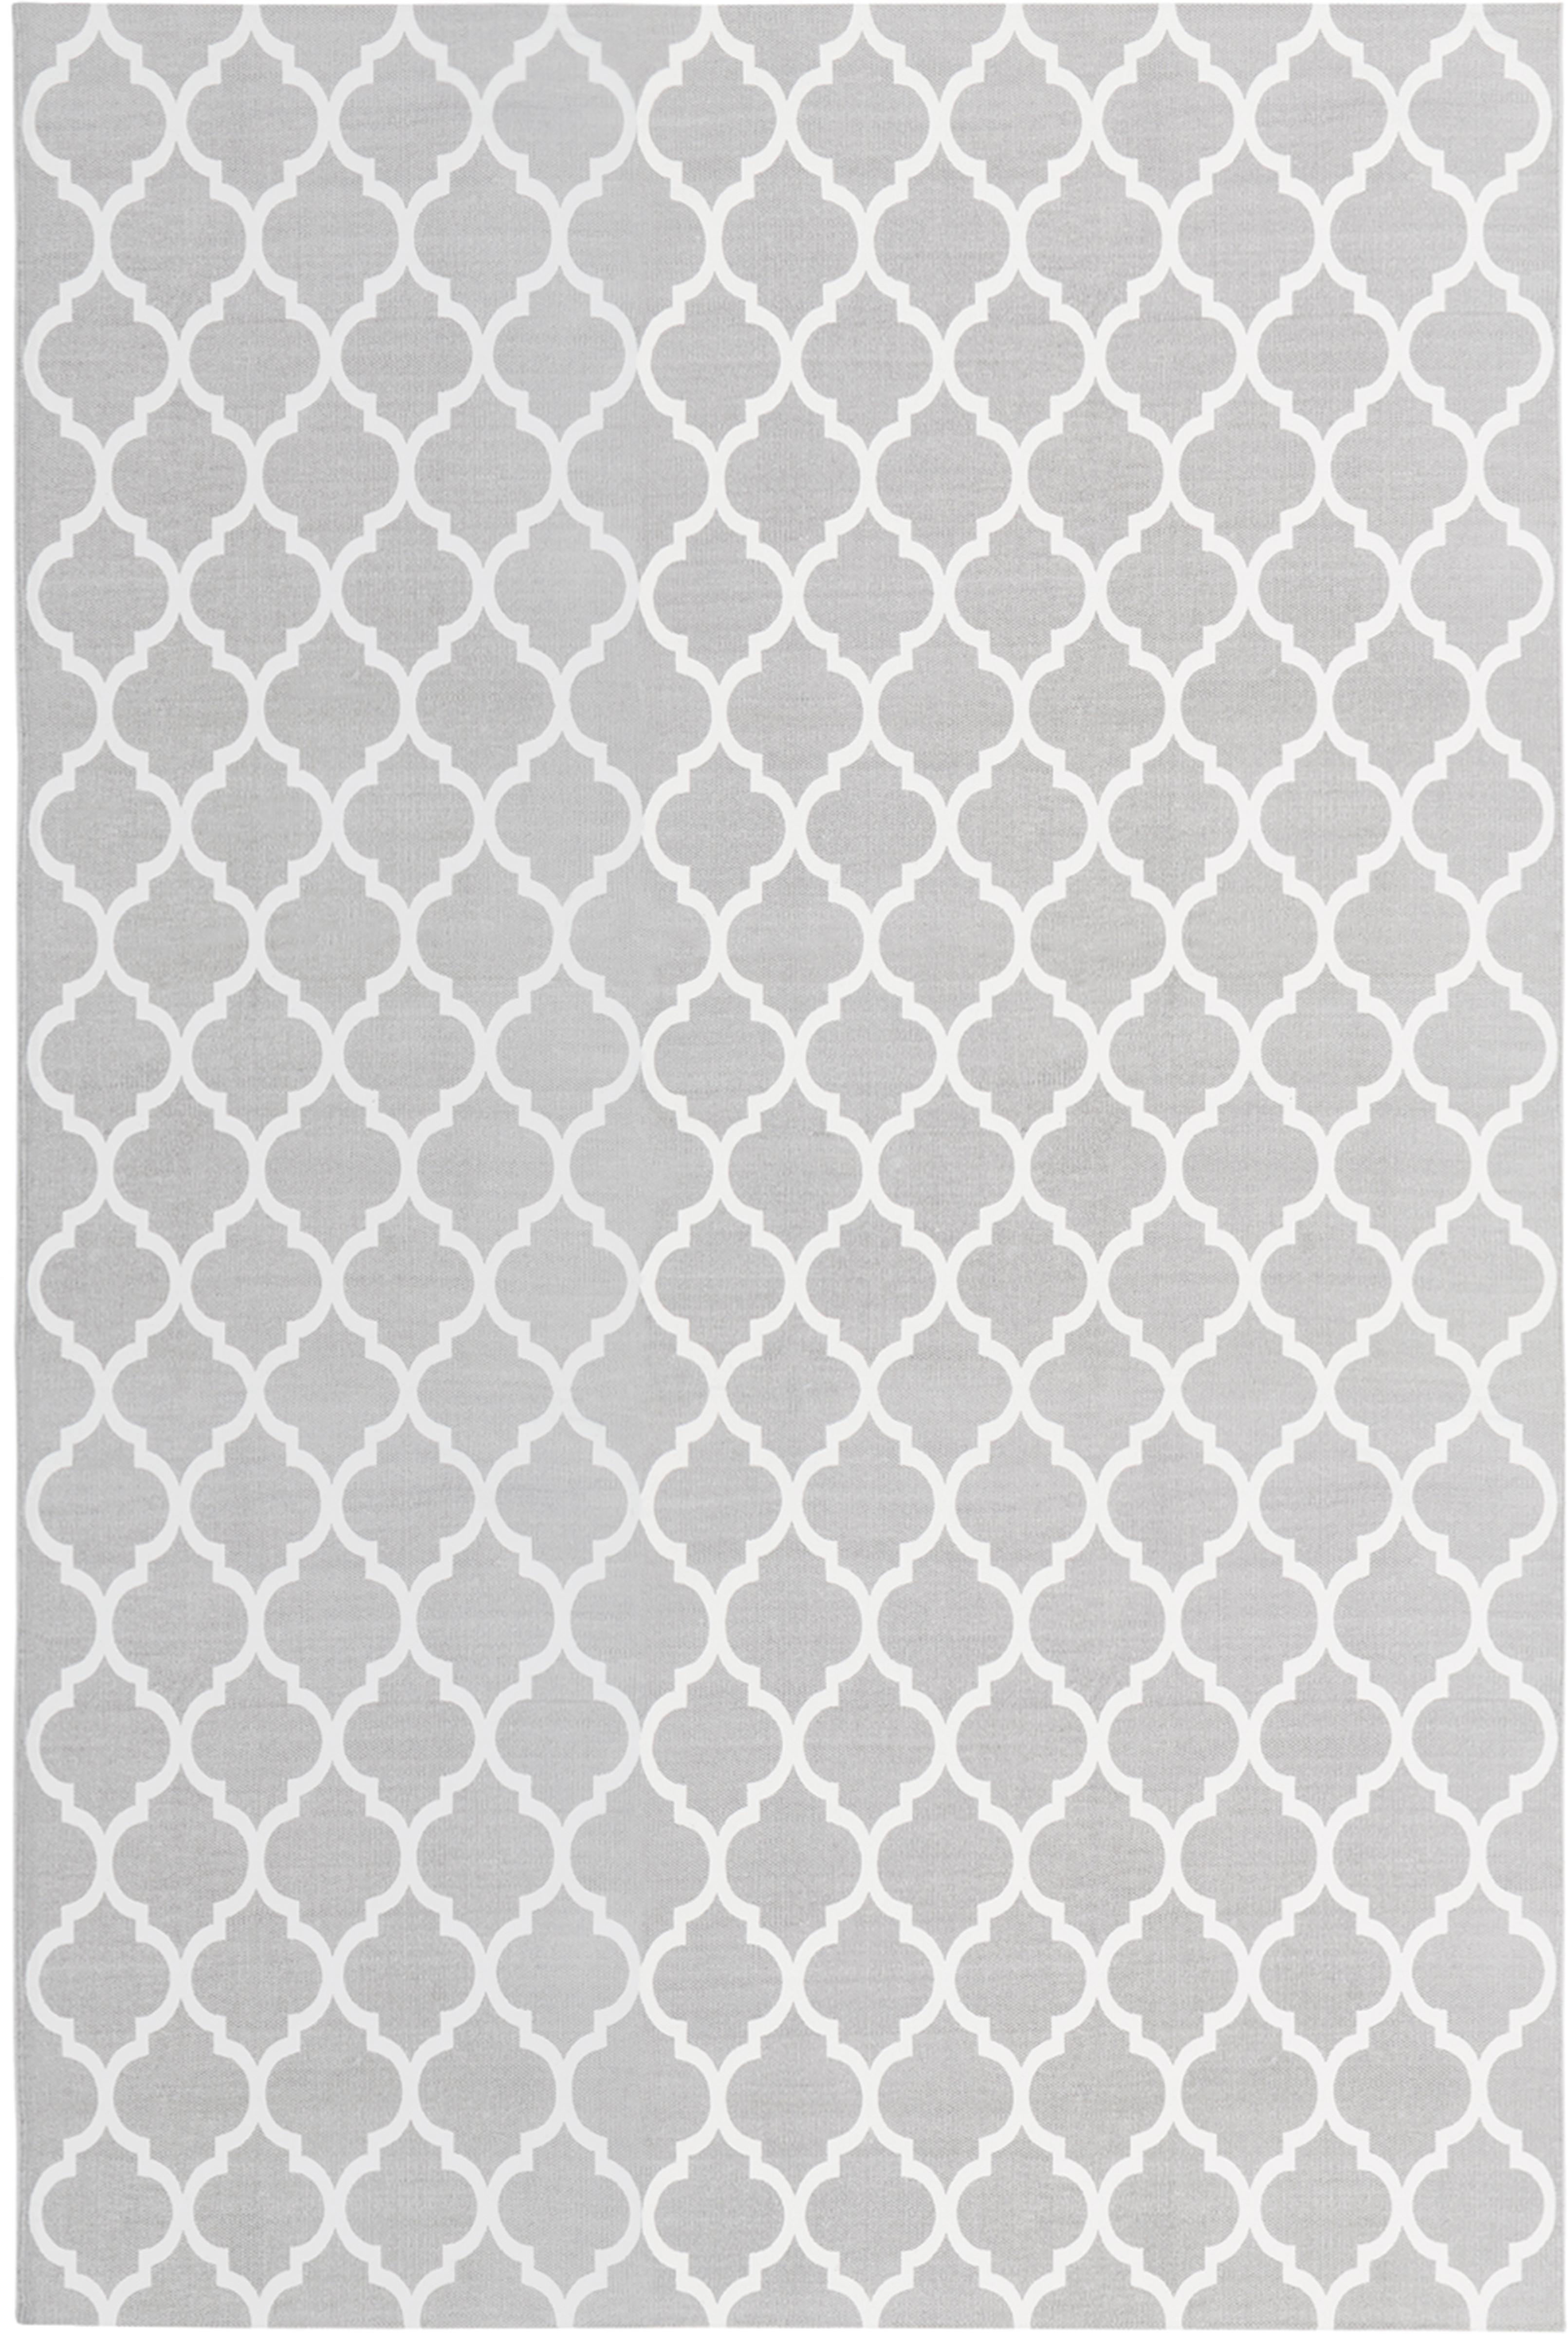 Flachgewebter Baumwollteppich Amira in Grau/Weiss, 100% Baumwolle, Hellgrau, Cremeweiss, B 200 x L 300 cm (Grösse L)